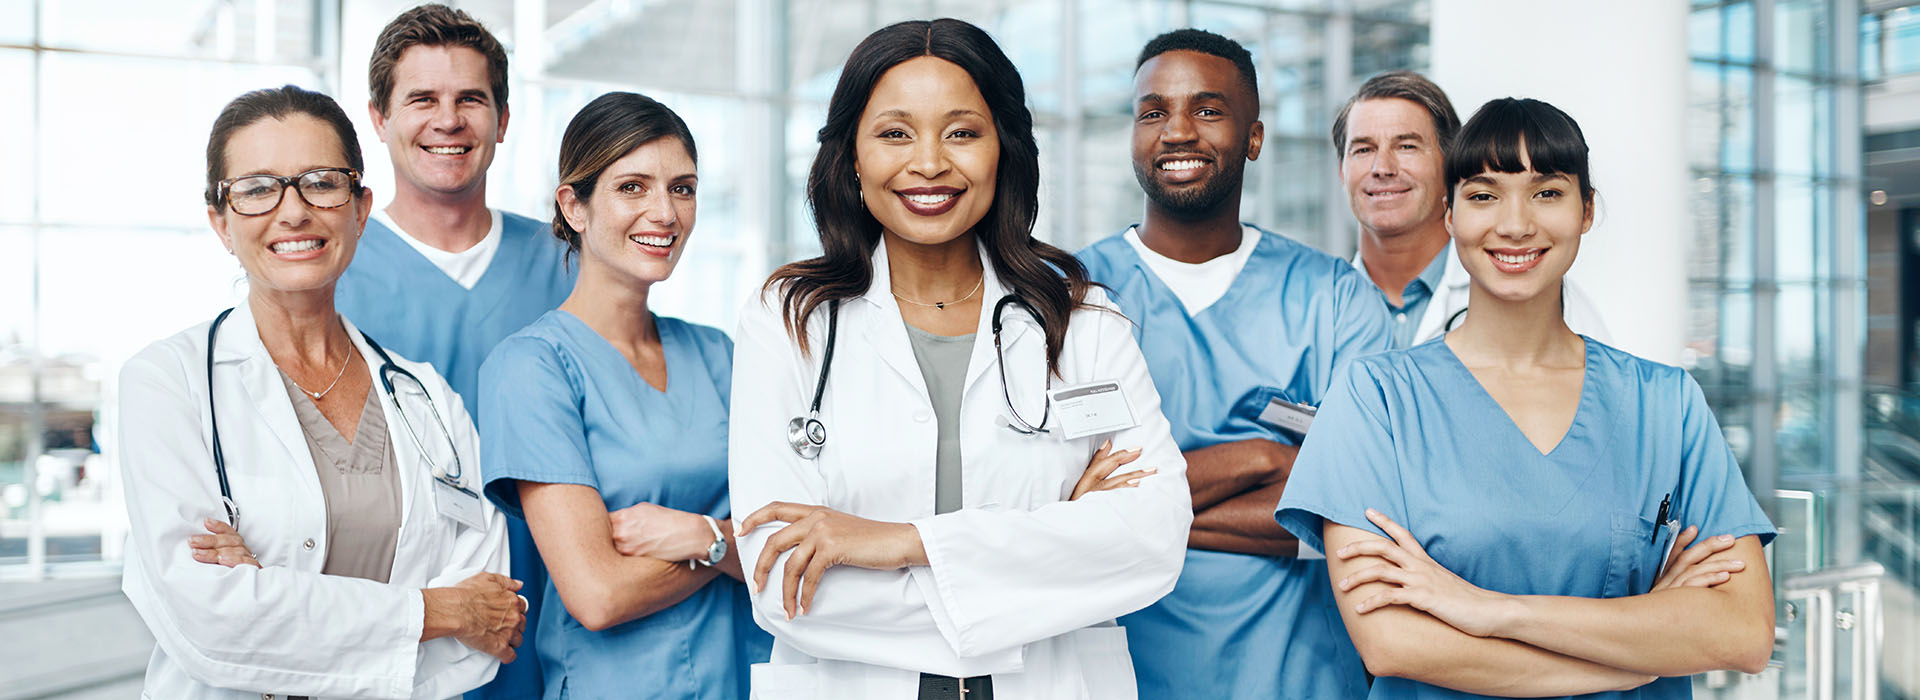 diverse healthcare team